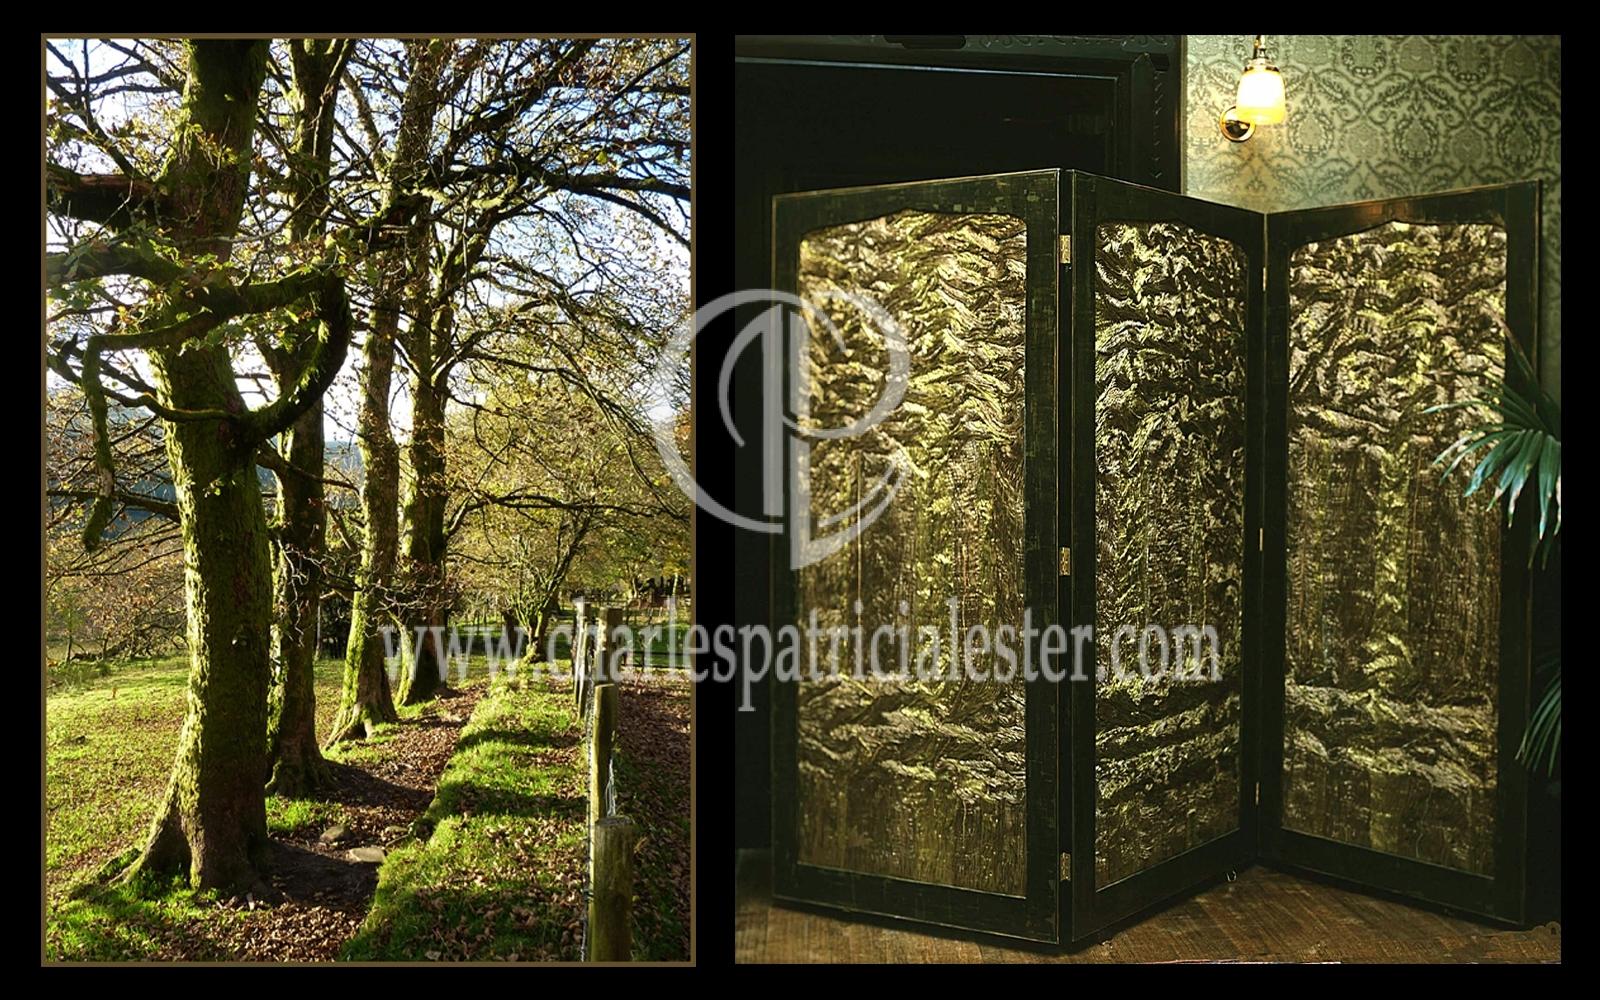 Inspirational textile art - tree screen Leighton House museum